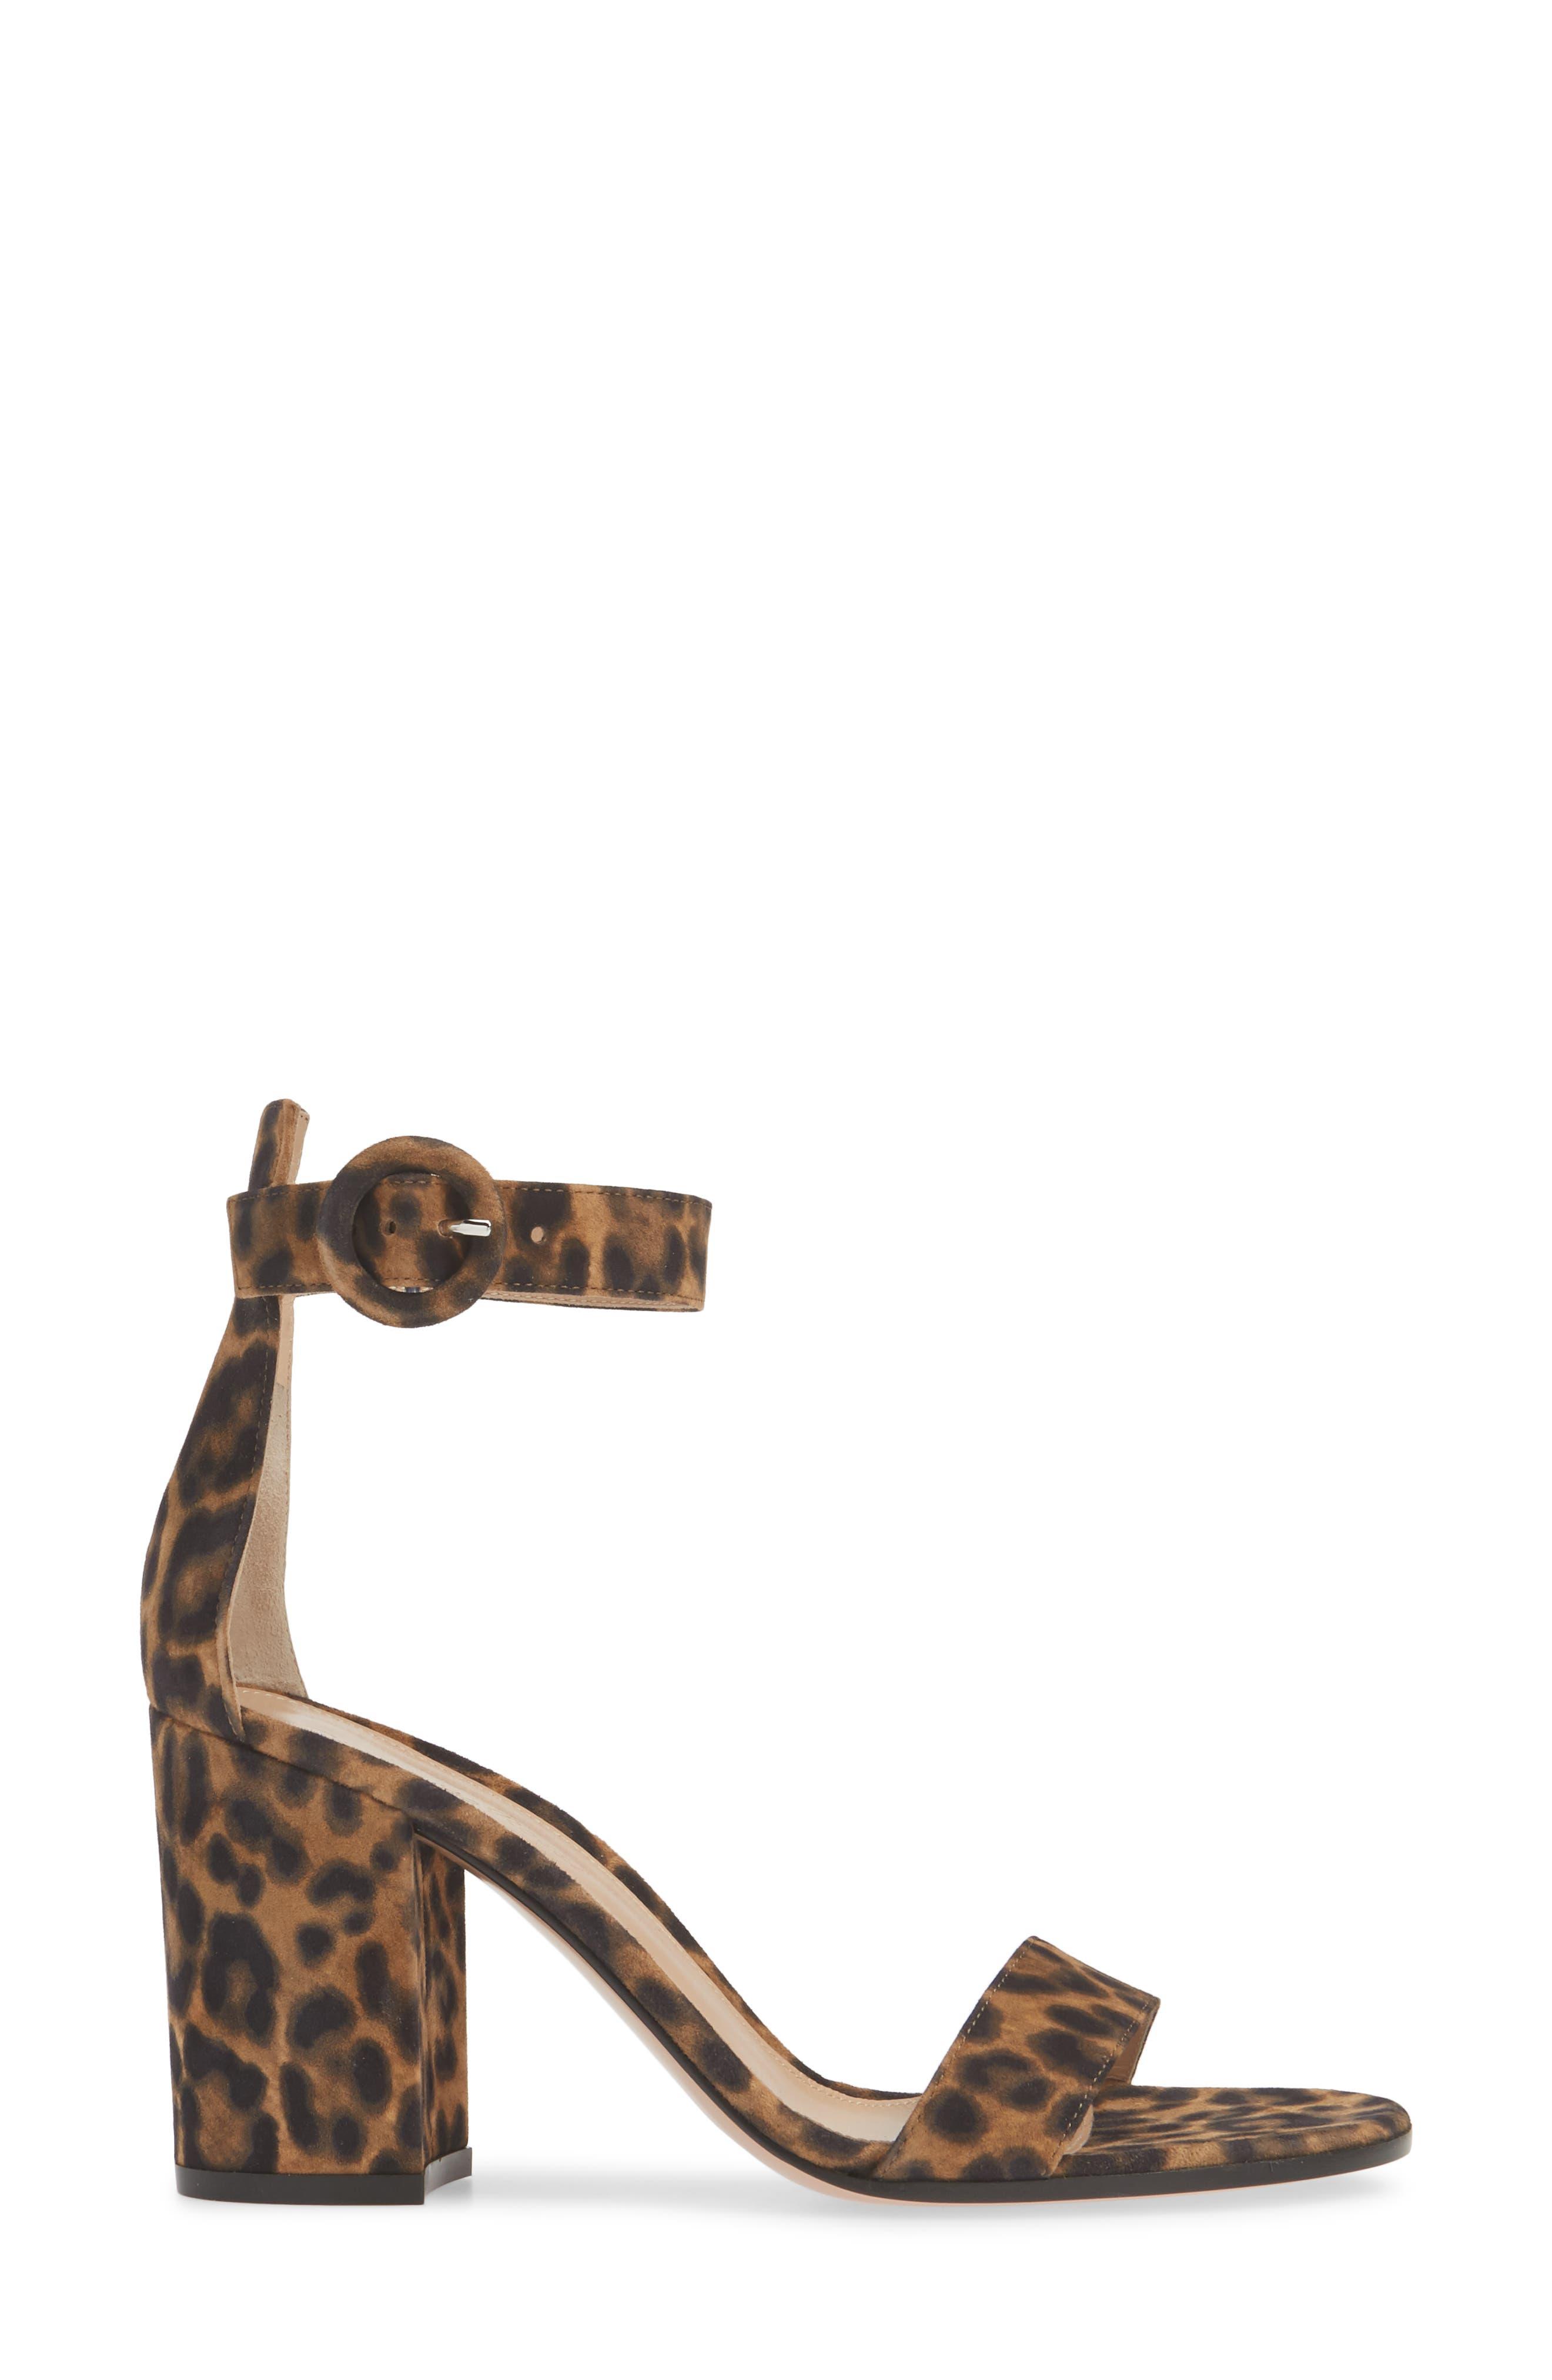 GIANVITO ROSSI, Leopard Print Ankle Strap Sandal, Alternate thumbnail 3, color, LEOPARD